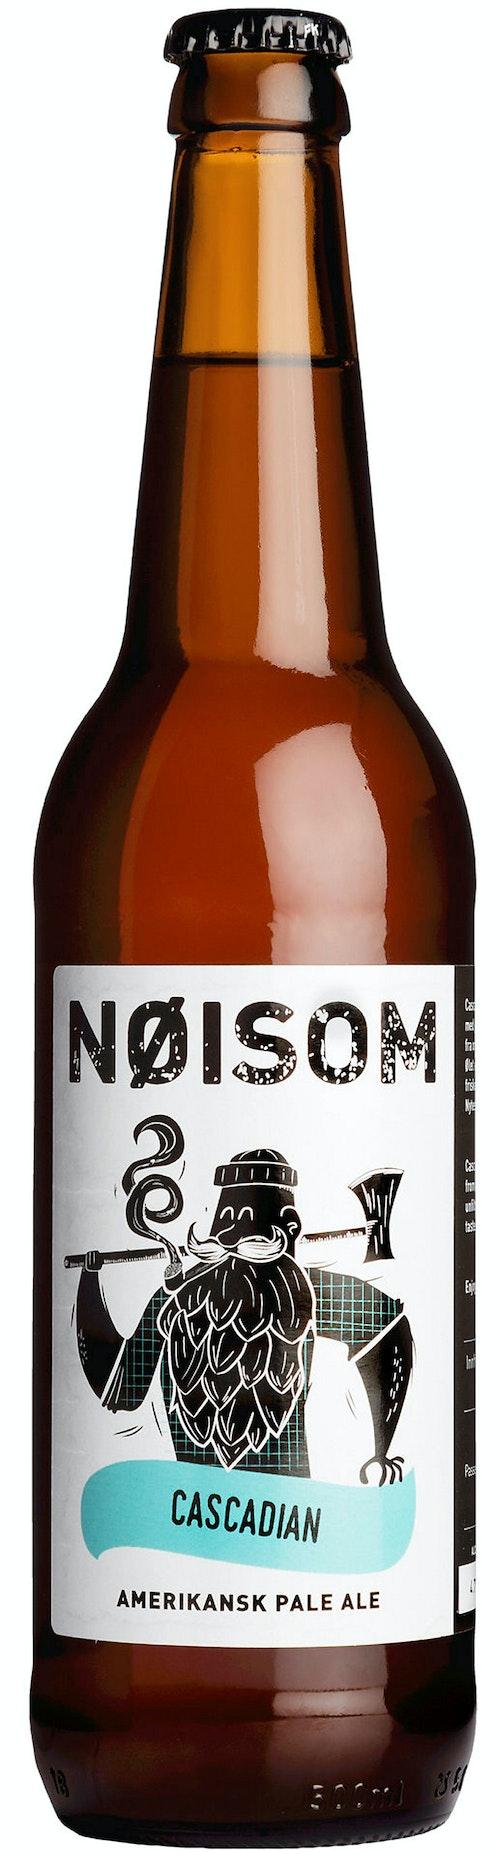 Nøisom Cascadian APA 0,5 l